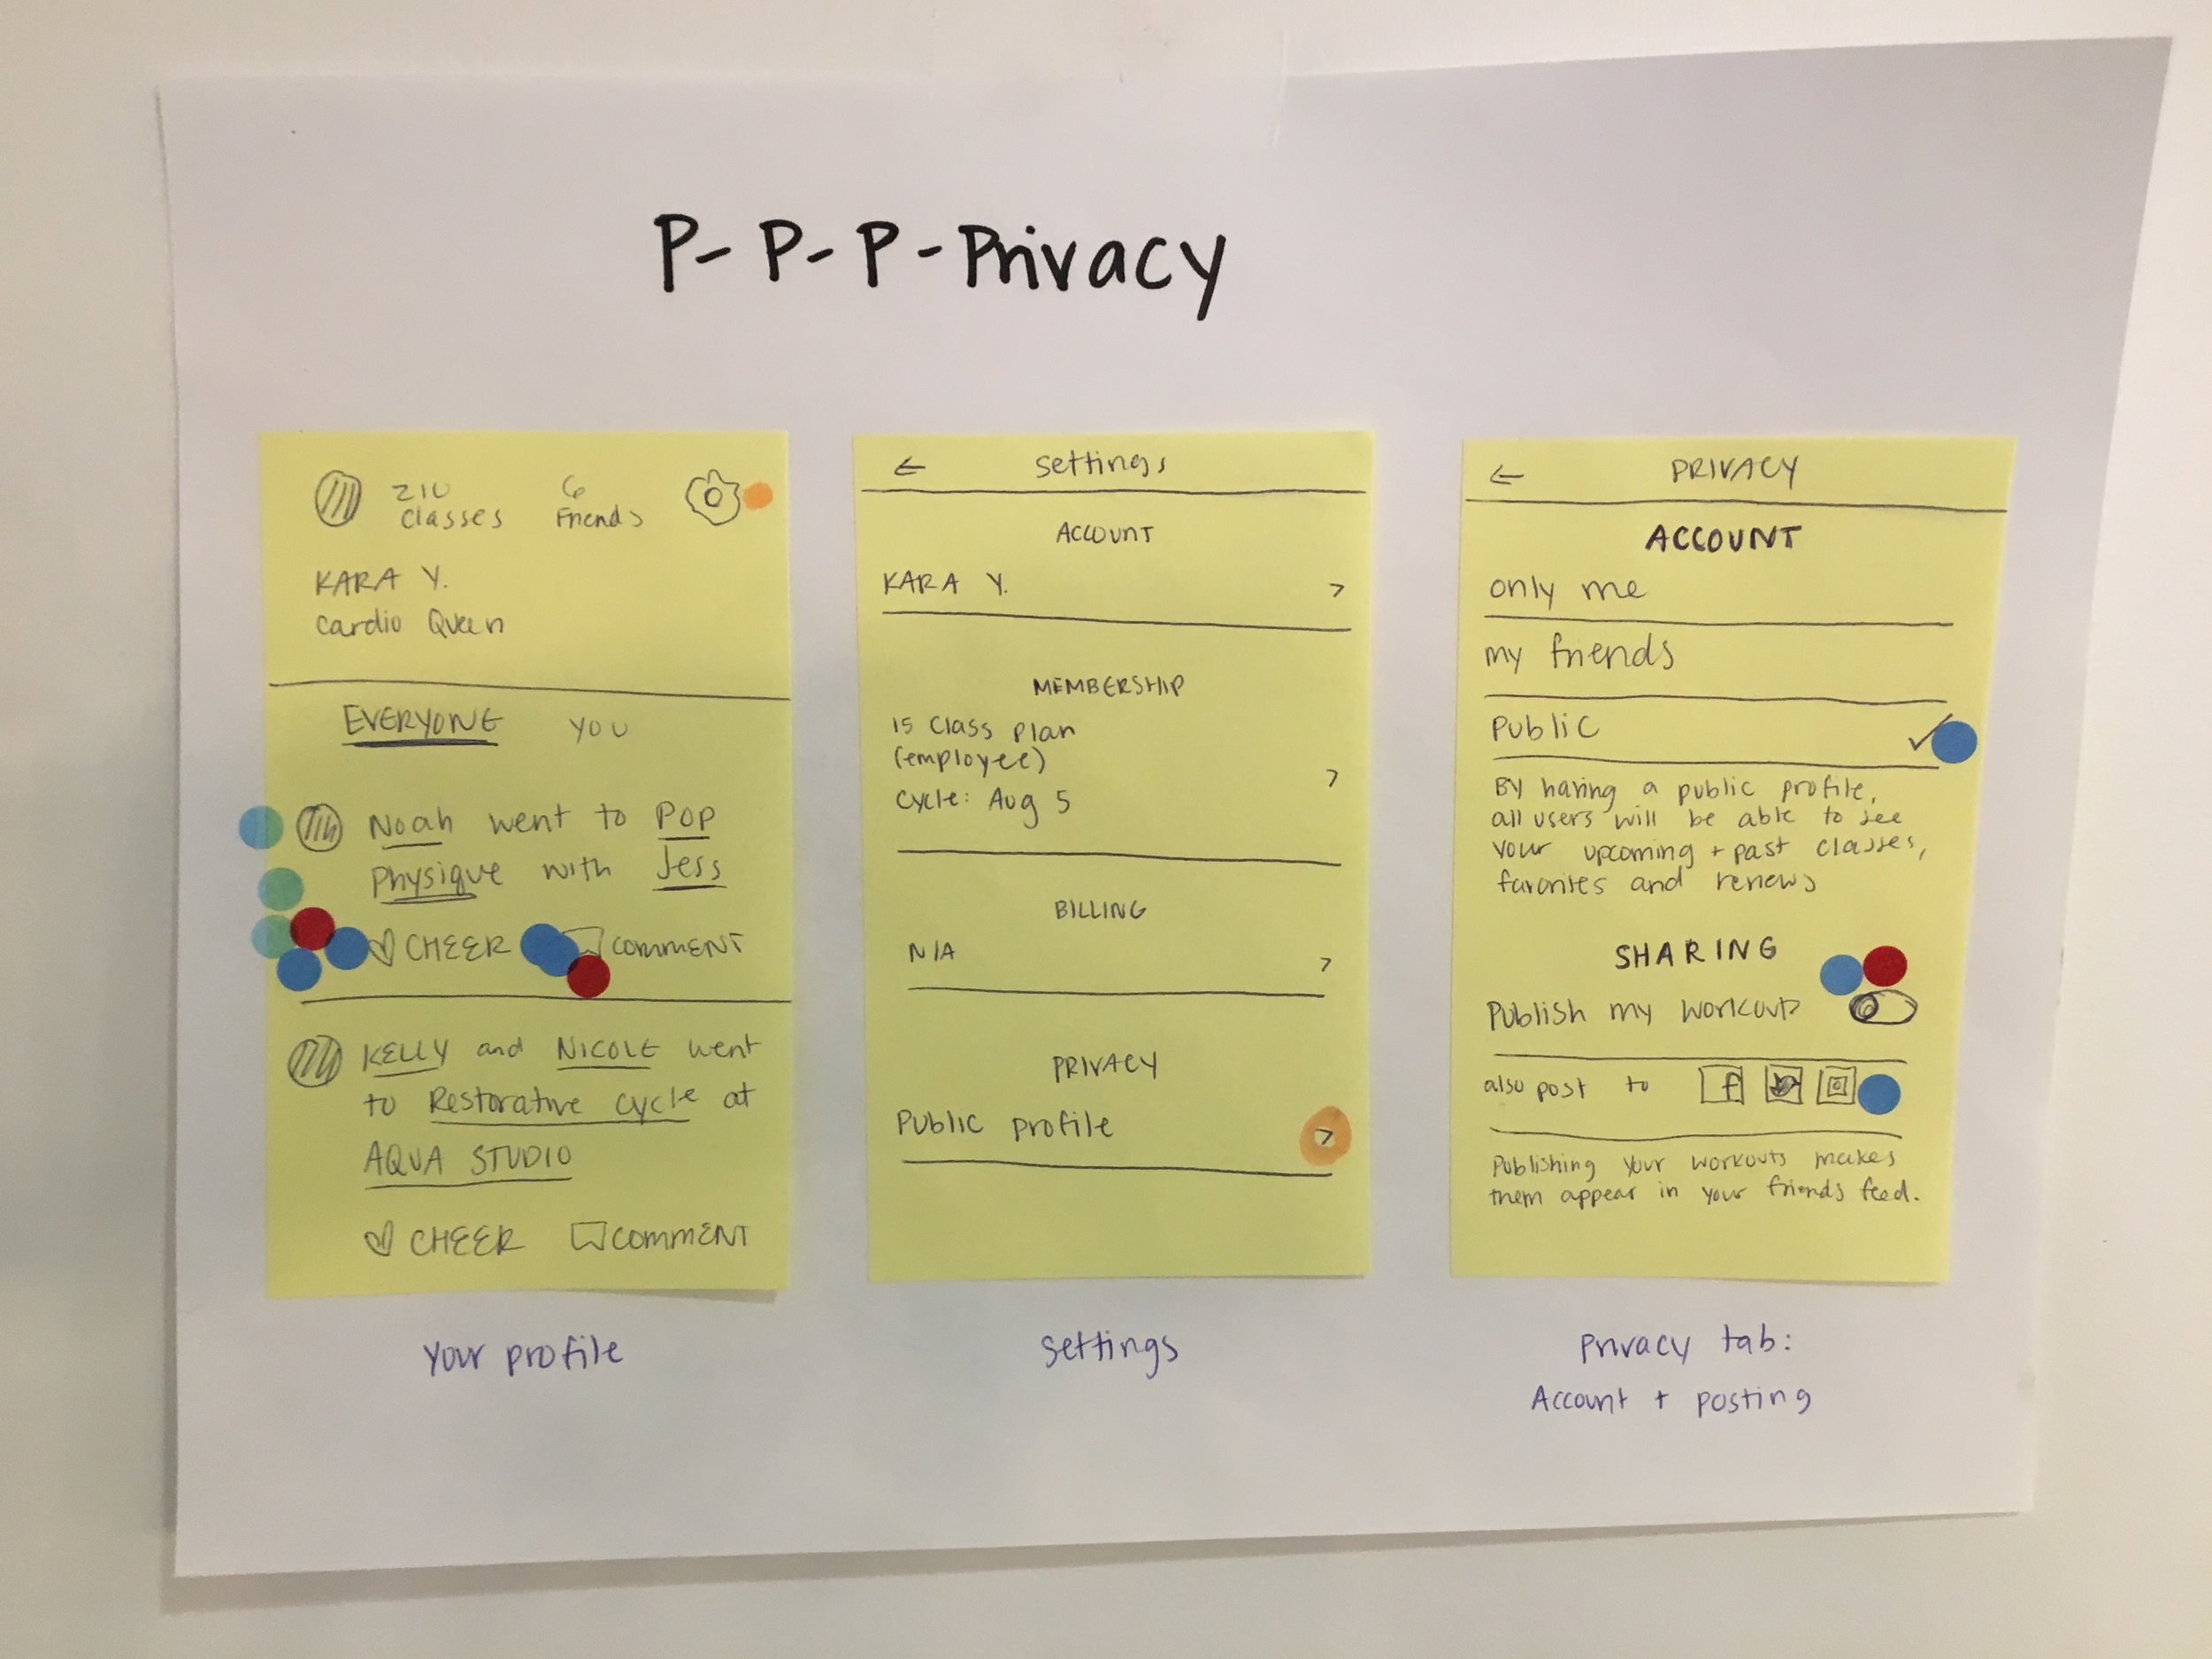 PPPPrivacy.JPG